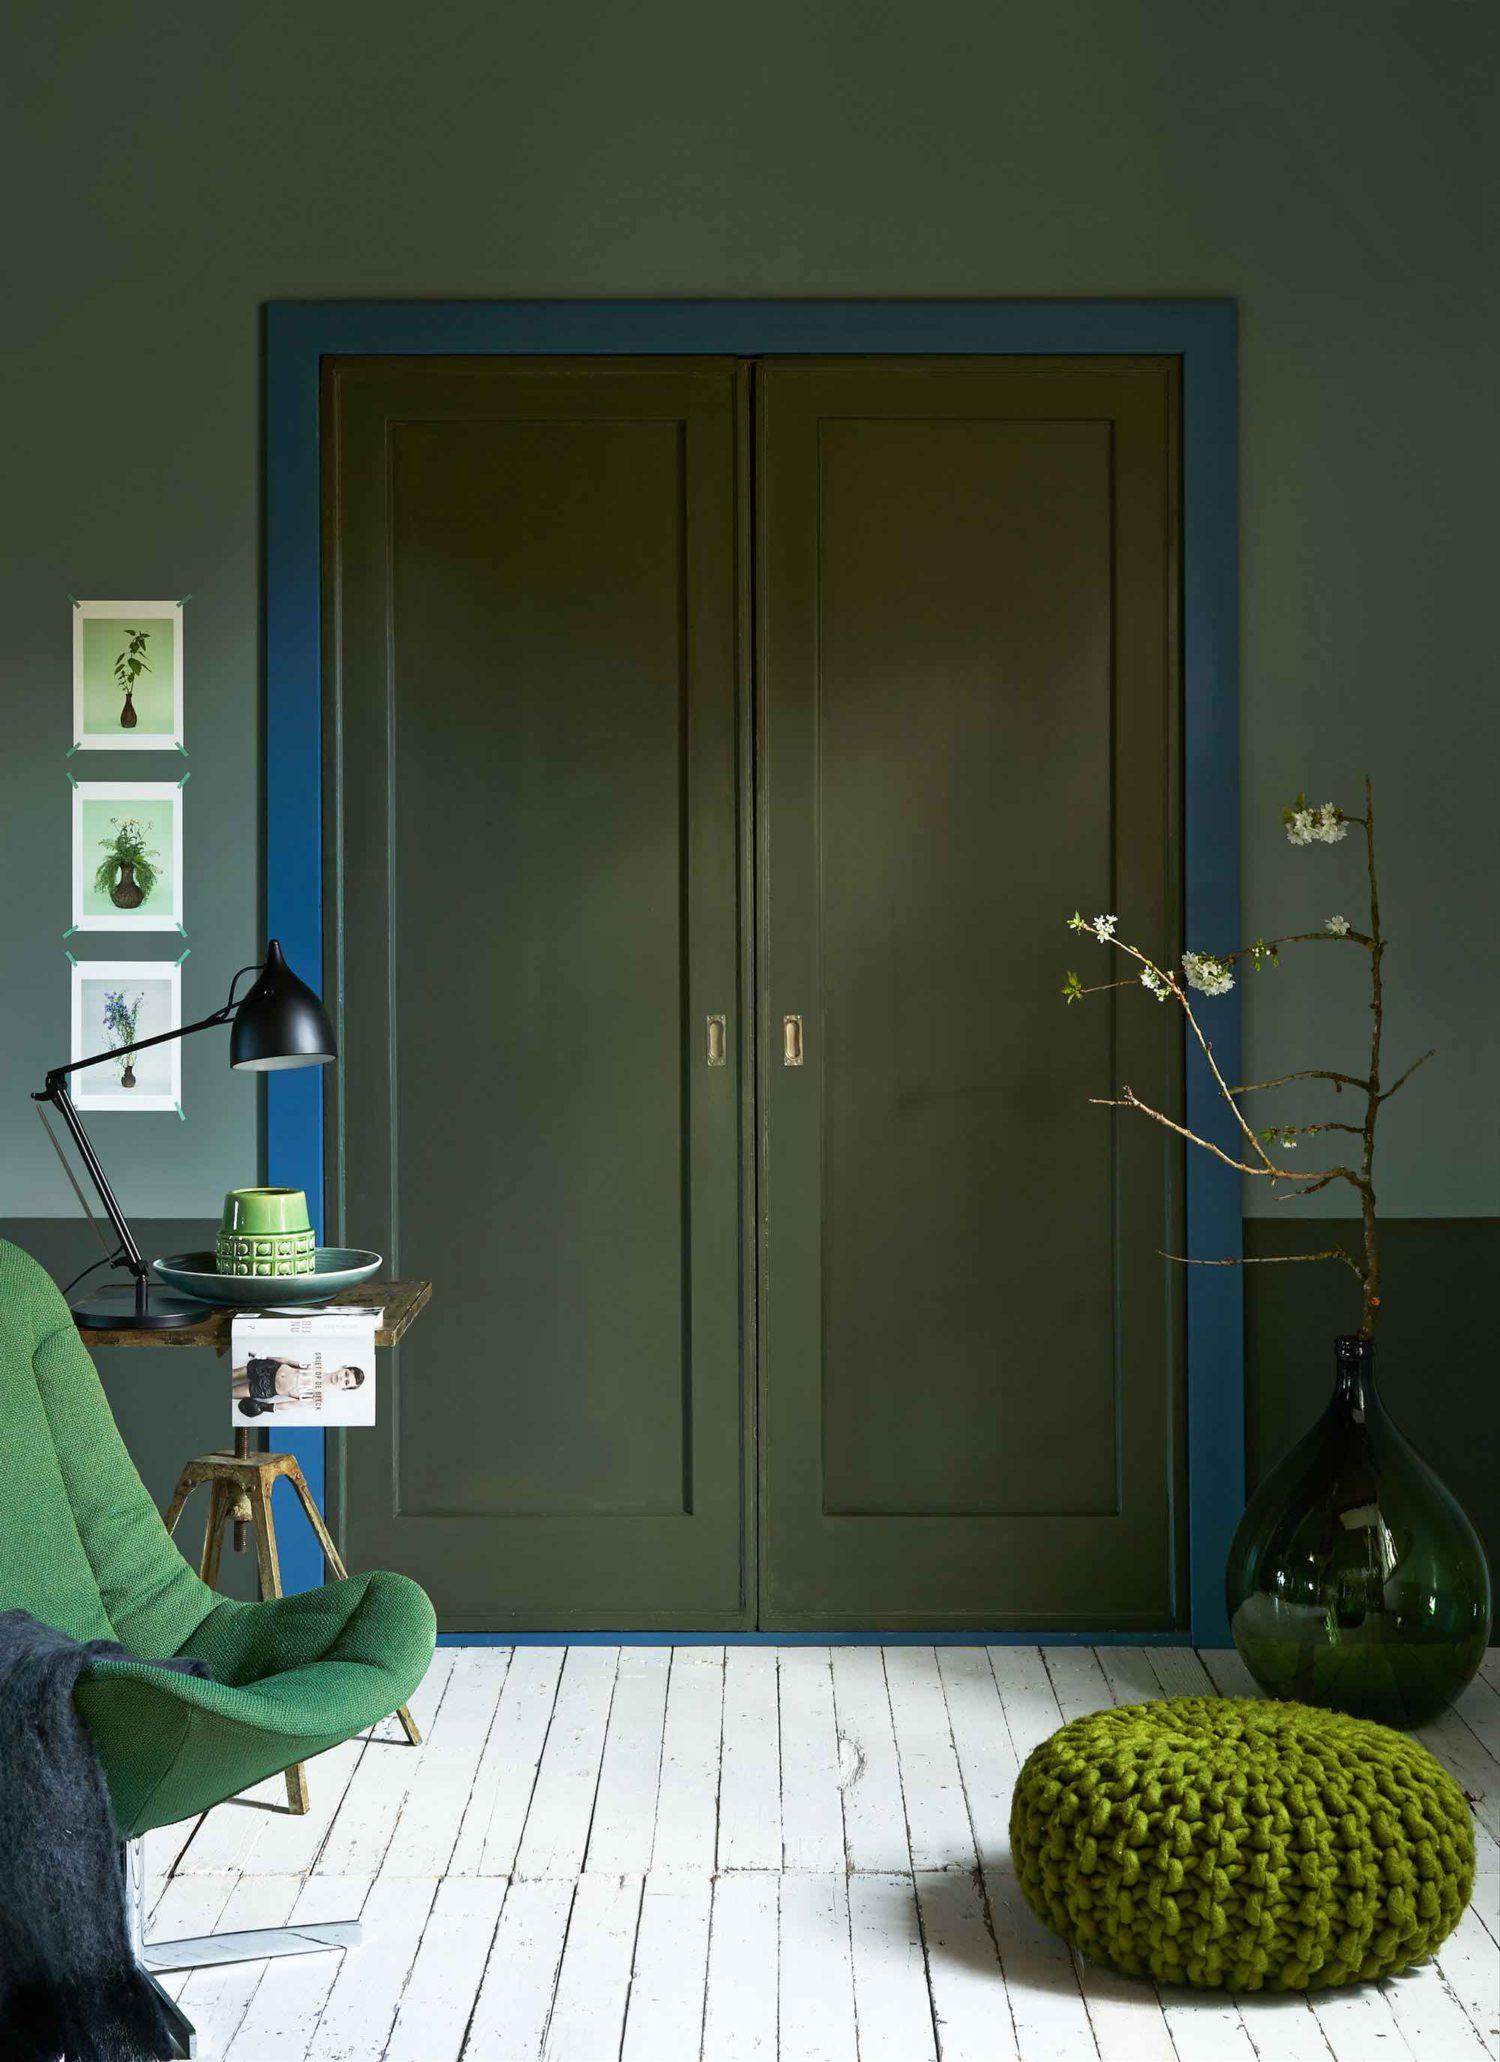 Farbmix, blau und grüne Wandfarben